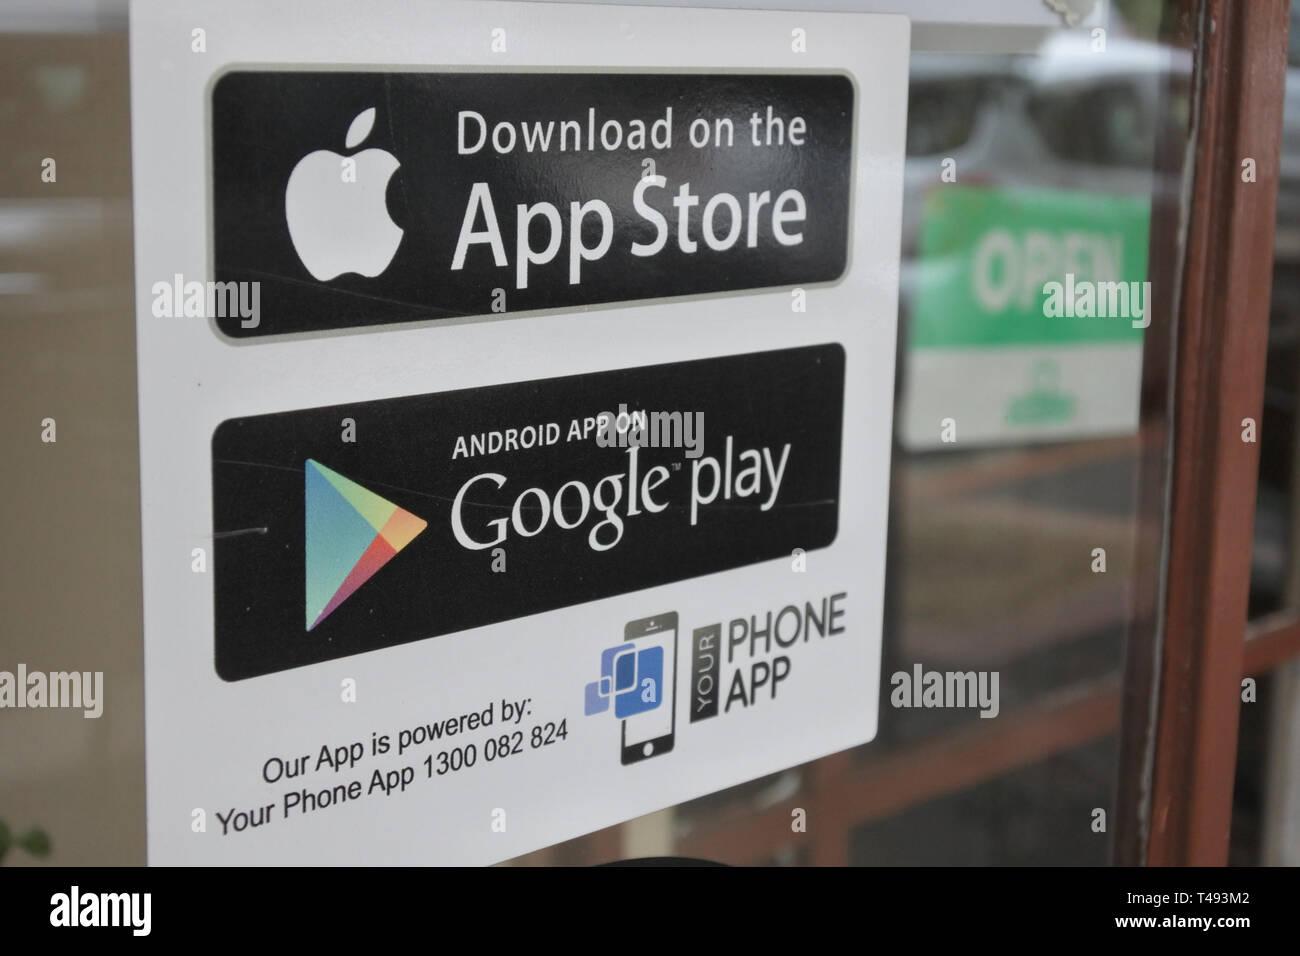 Google Play Store Stock Photos & Google Play Store Stock